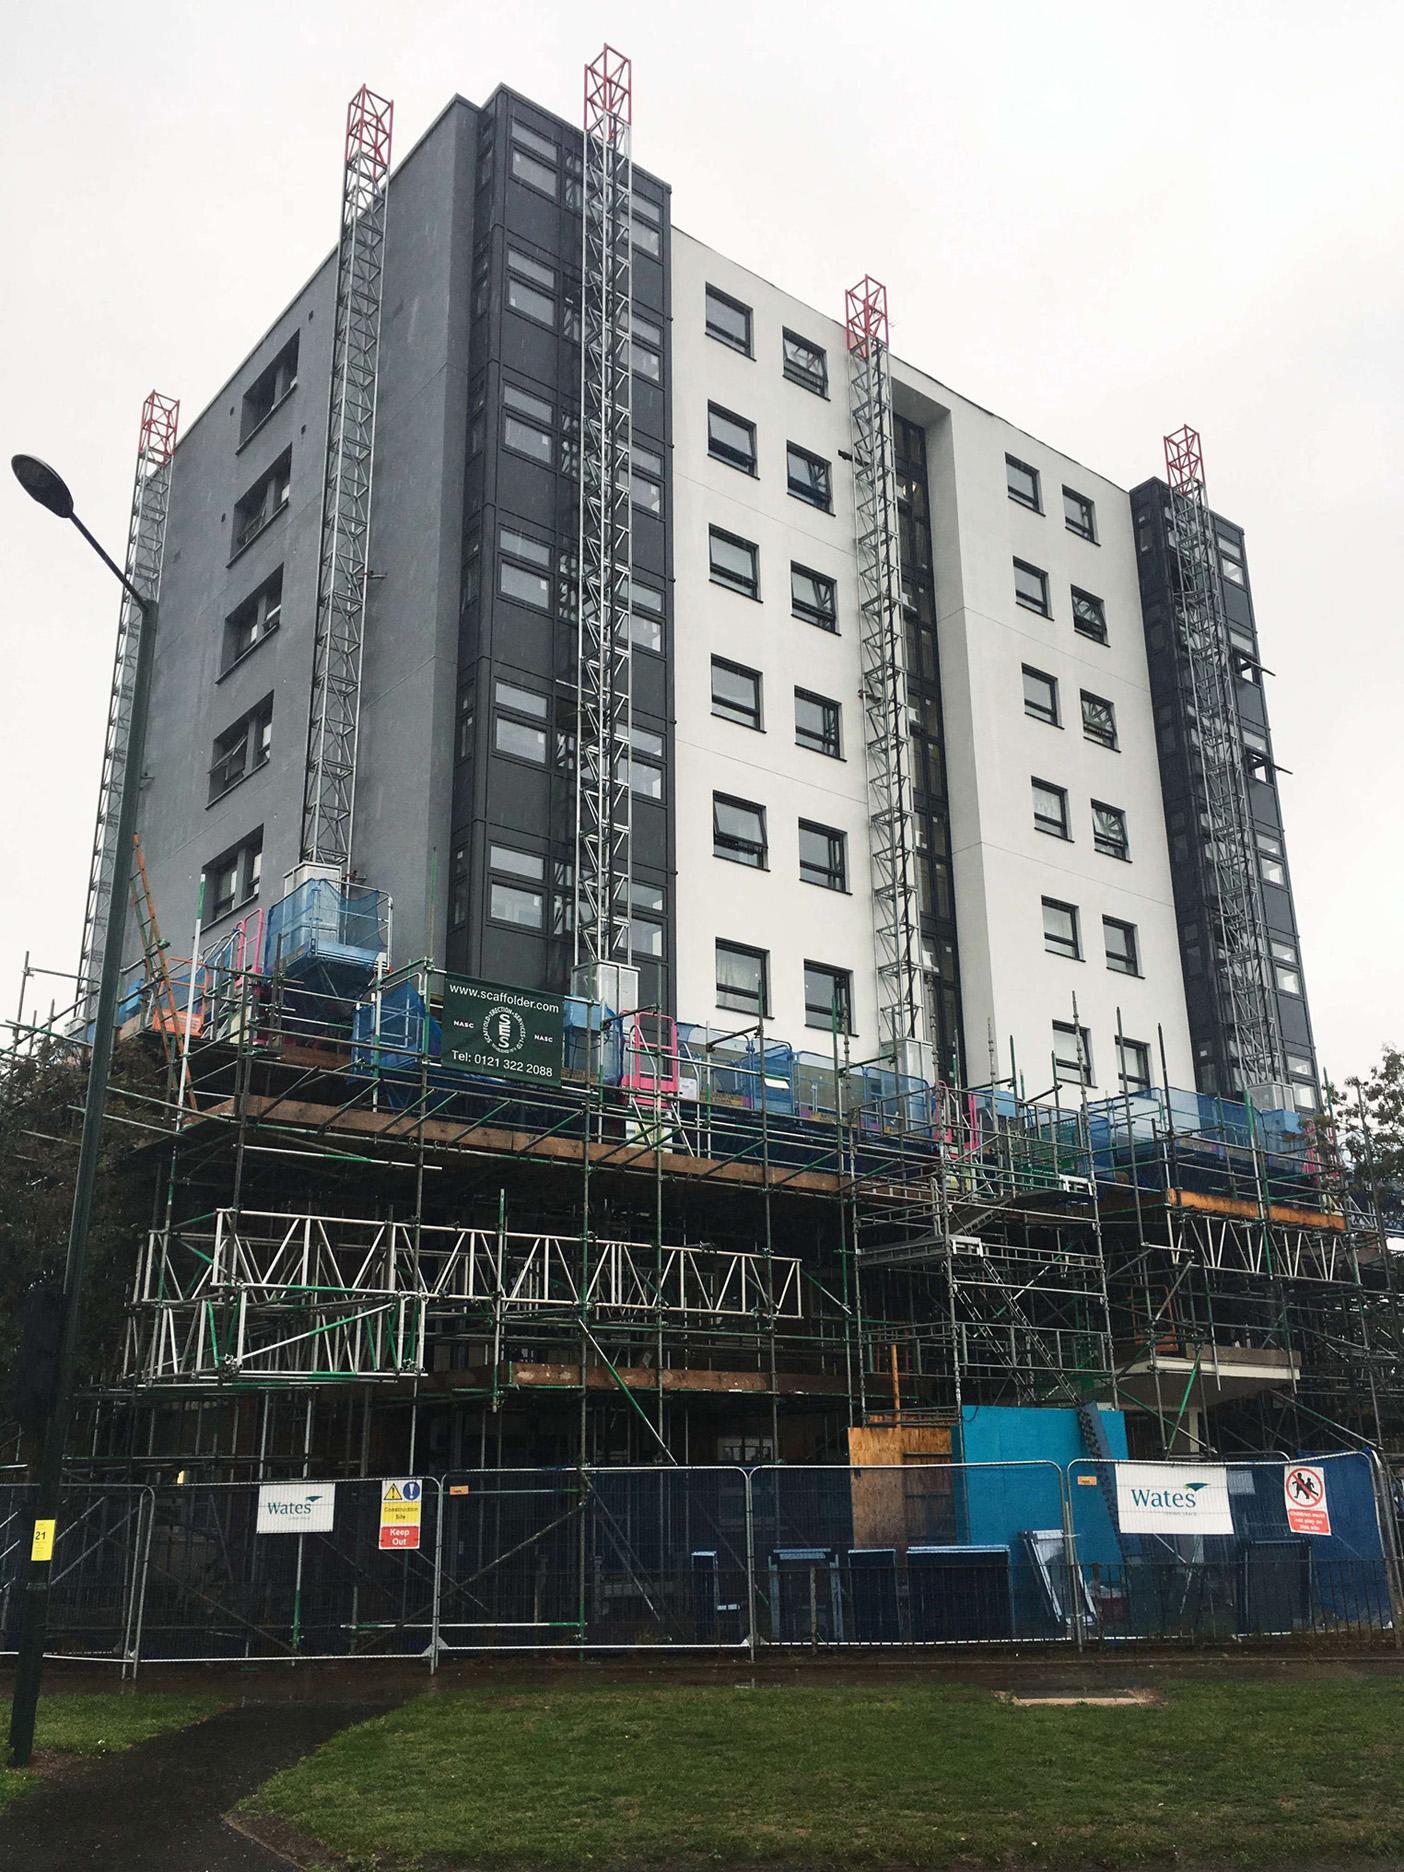 Shelforce boss backs Prime Minister's pledge to make people proud of social housing